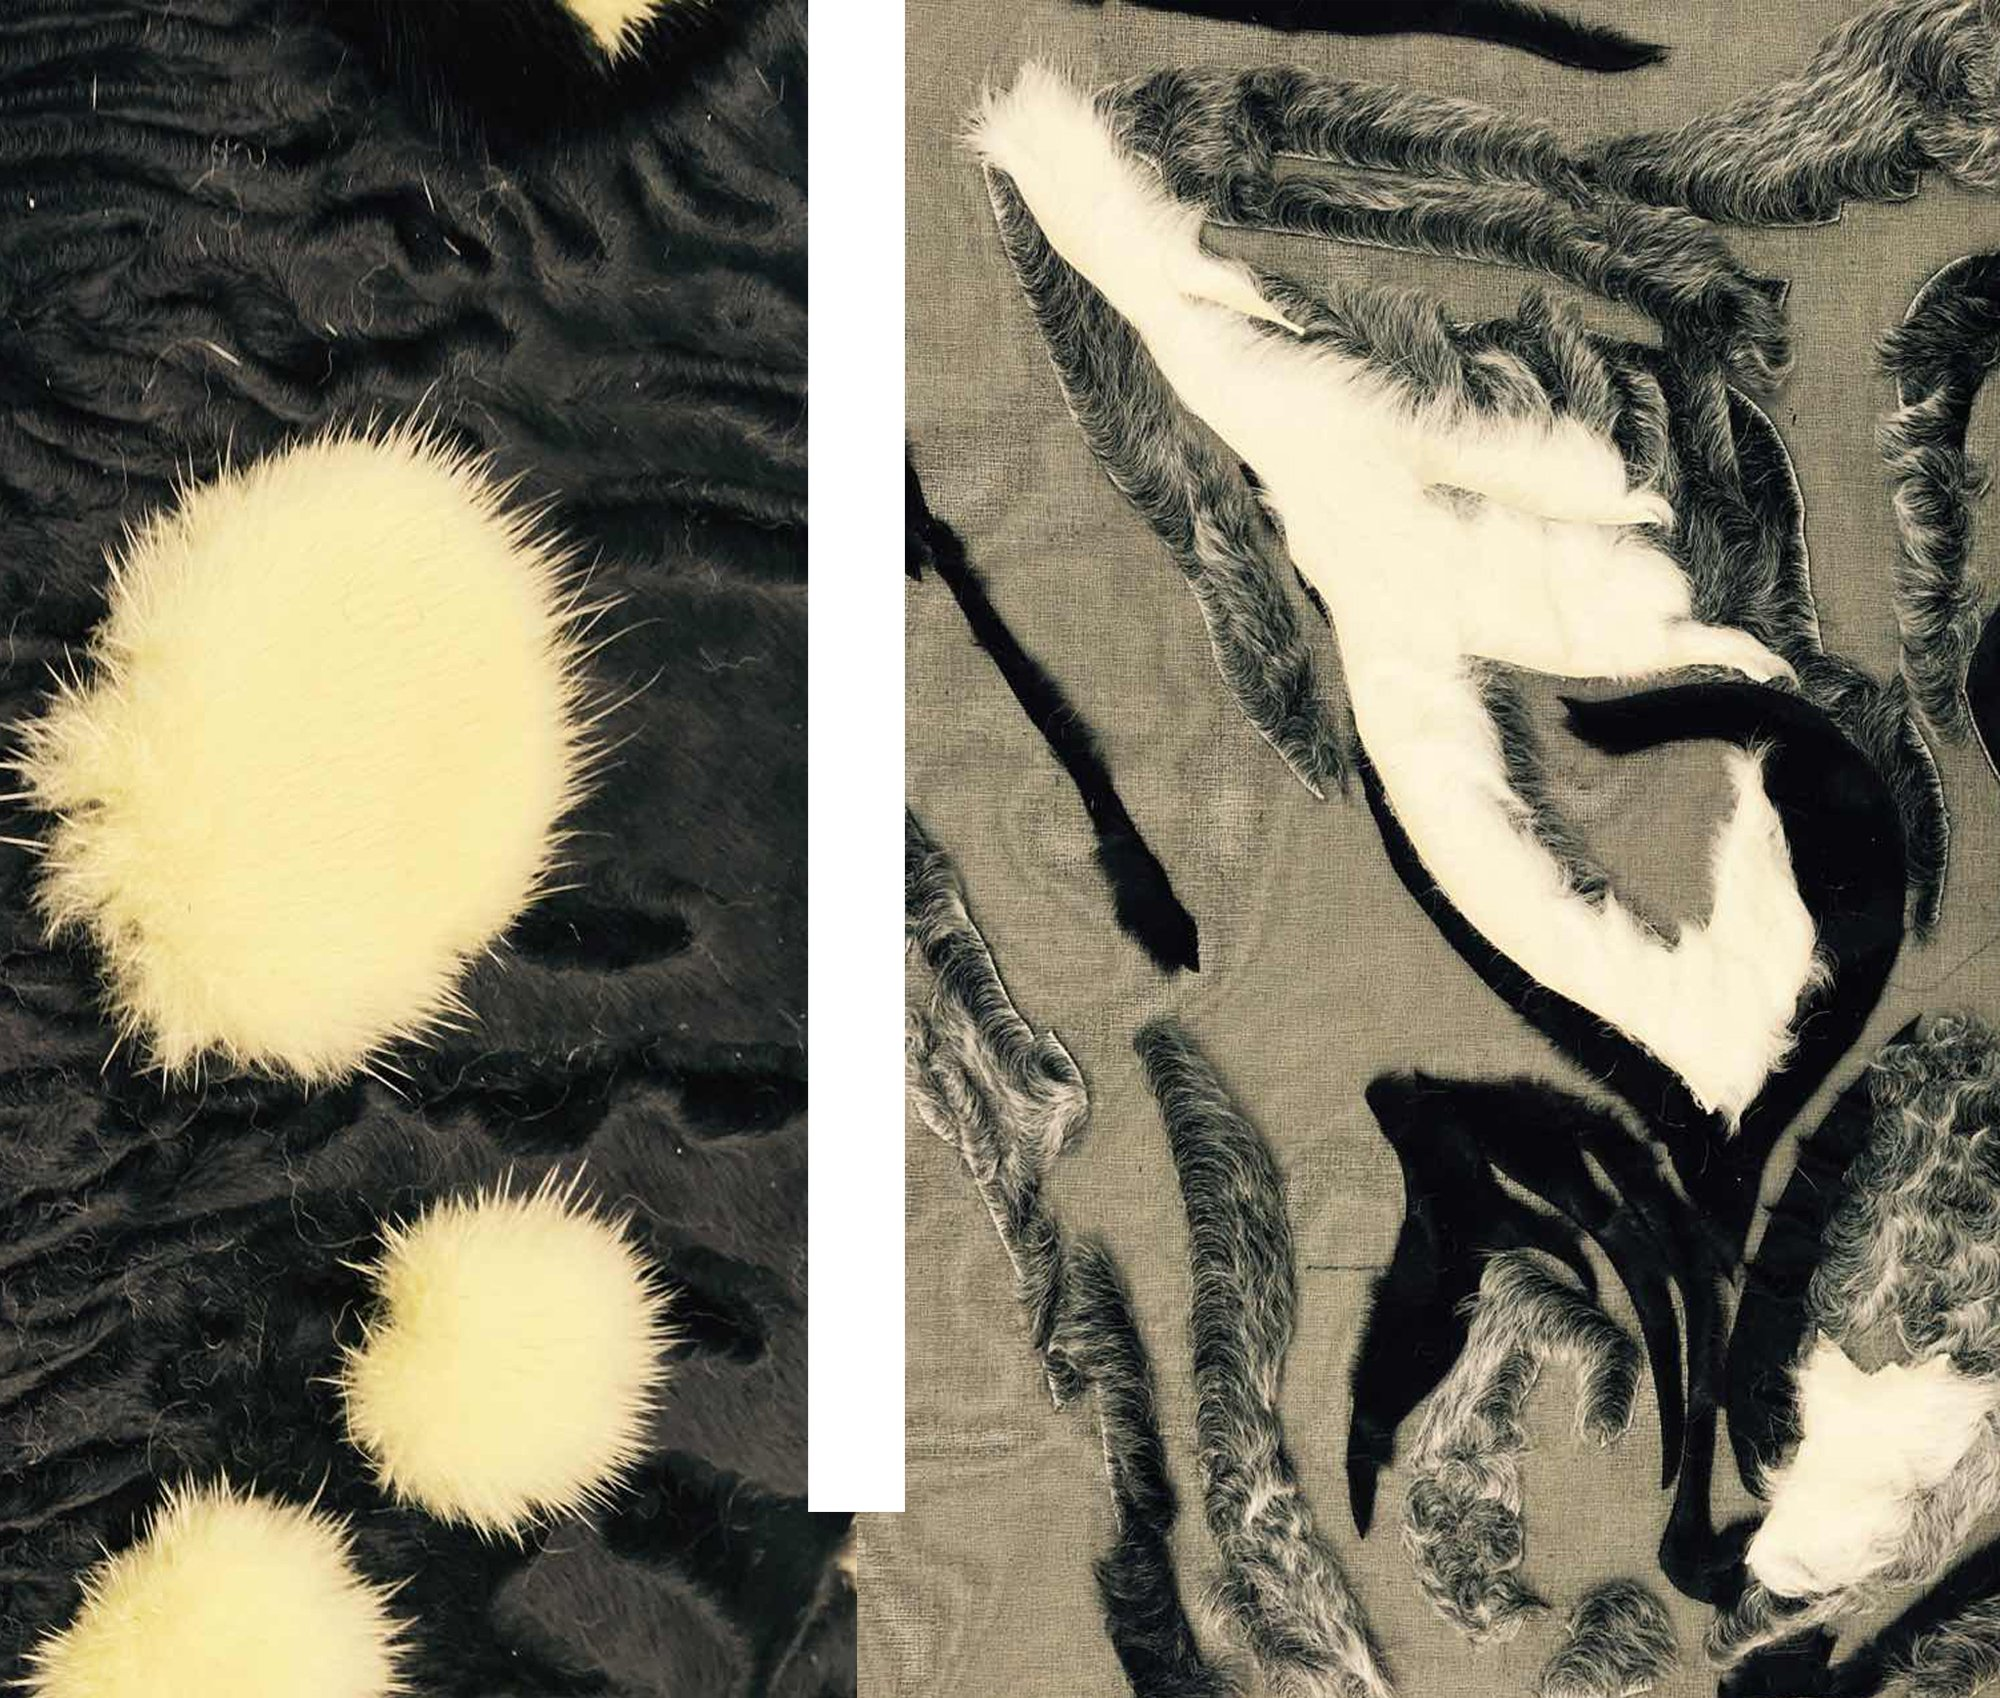 Kopenhagen Fur, Wang Yutao, Swakara, fur, China, Copenhaguen, fashion, design